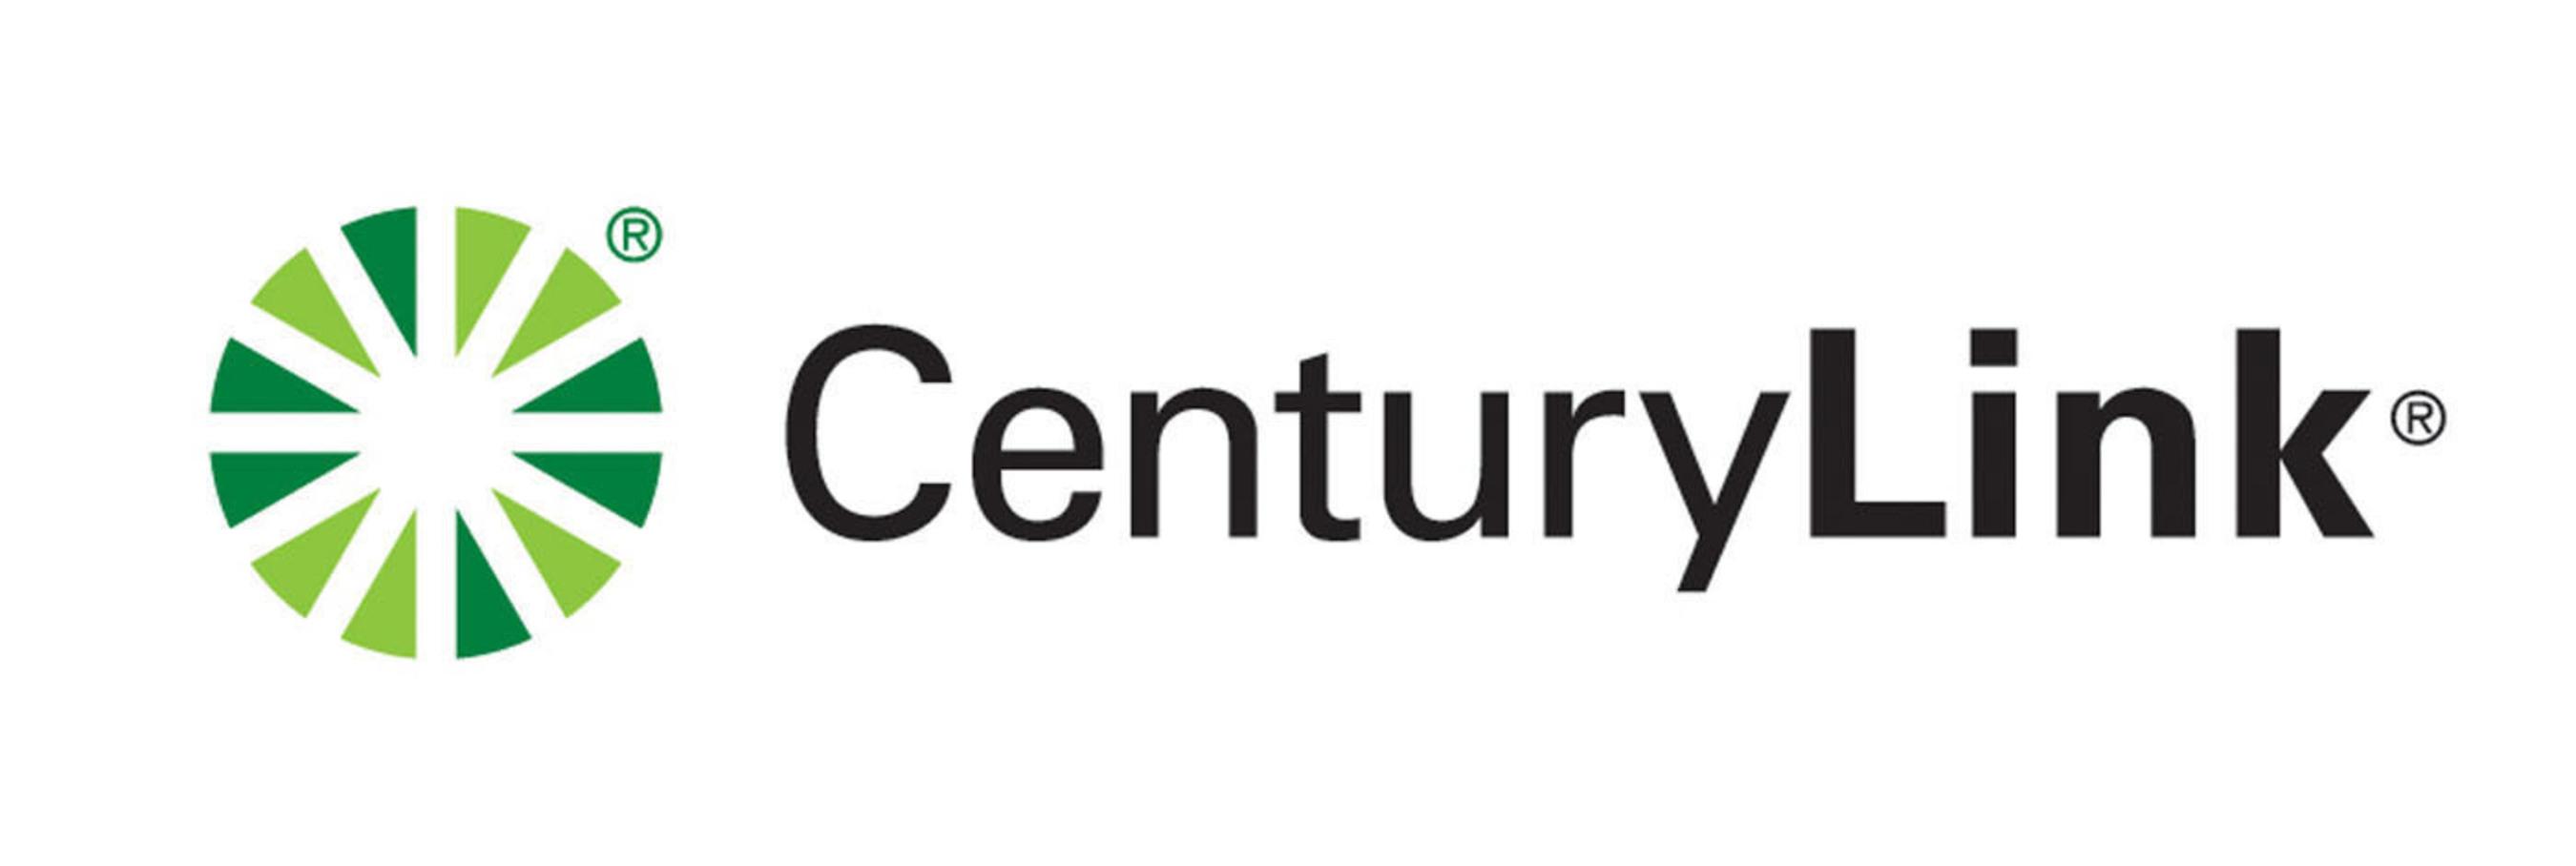 Centurylink Acquires Cognilytics To Extend Its It Services